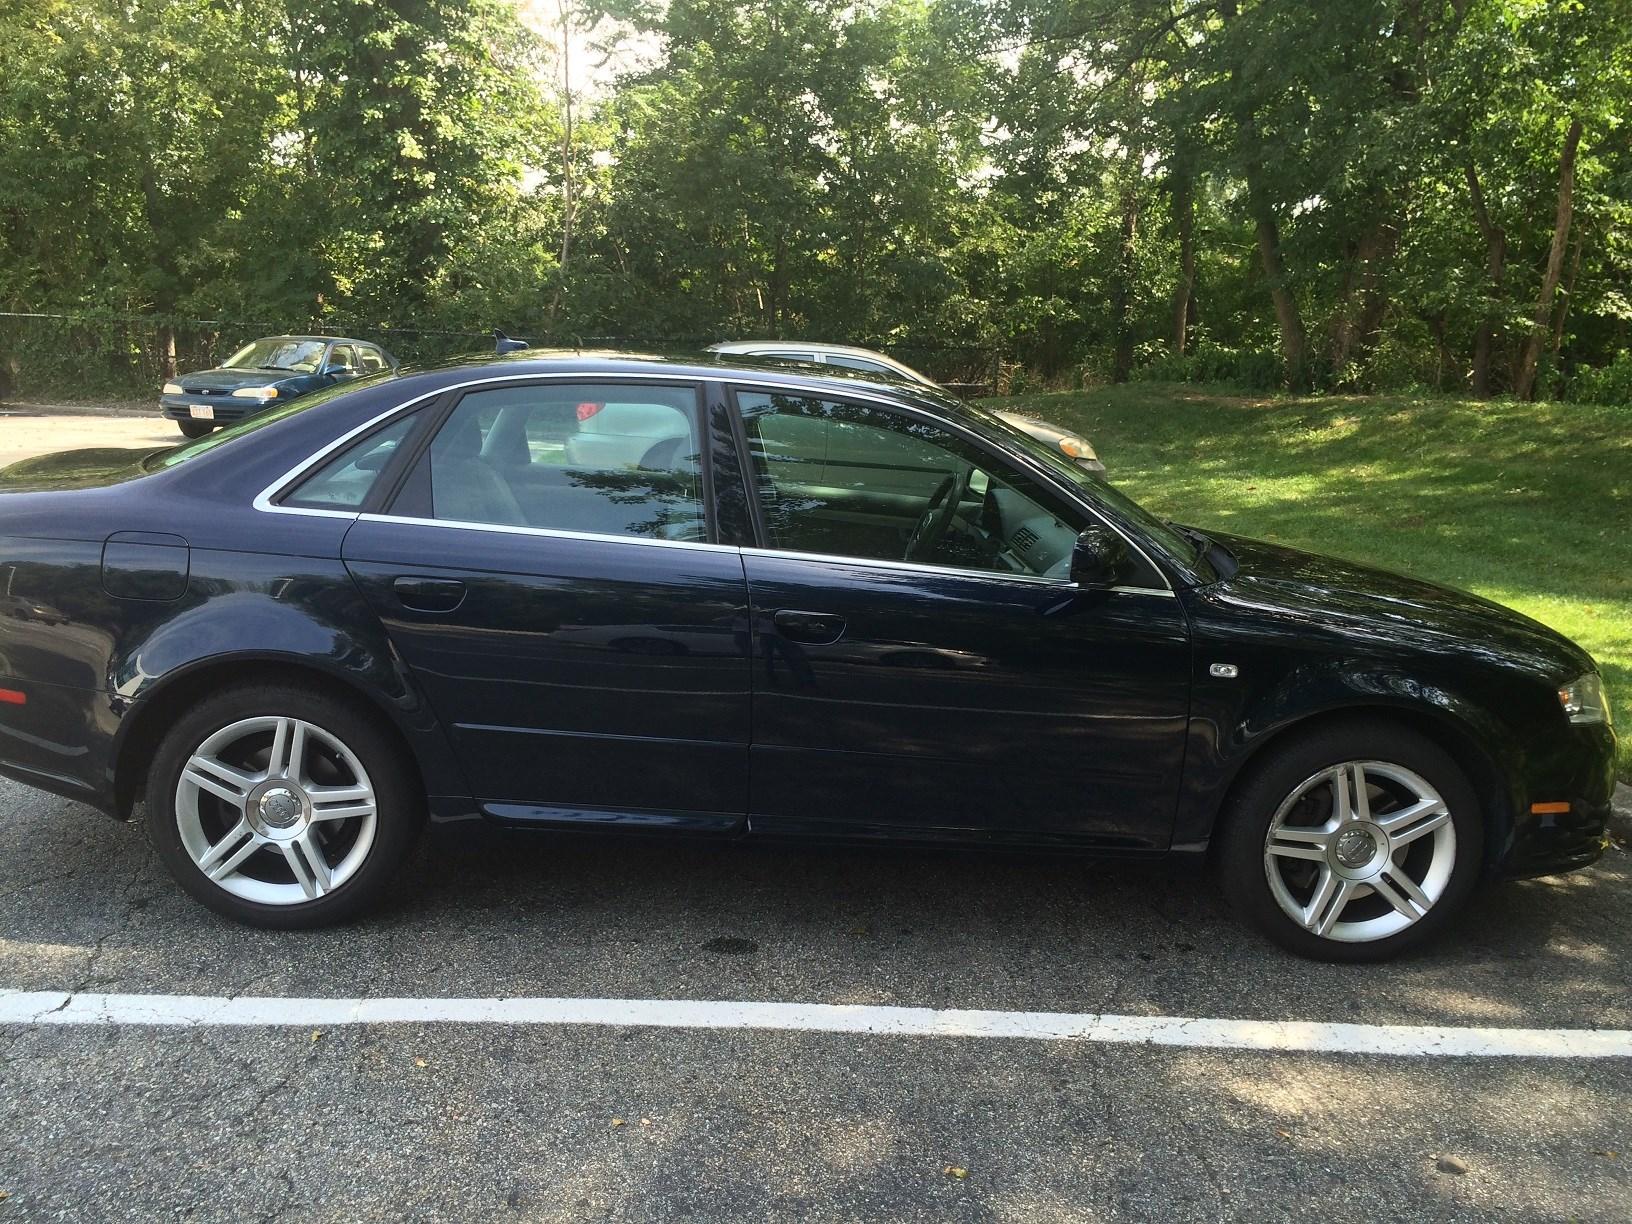 2008 Audi A4 S line 2 0T AWD Quattro For Sale Mint Condition